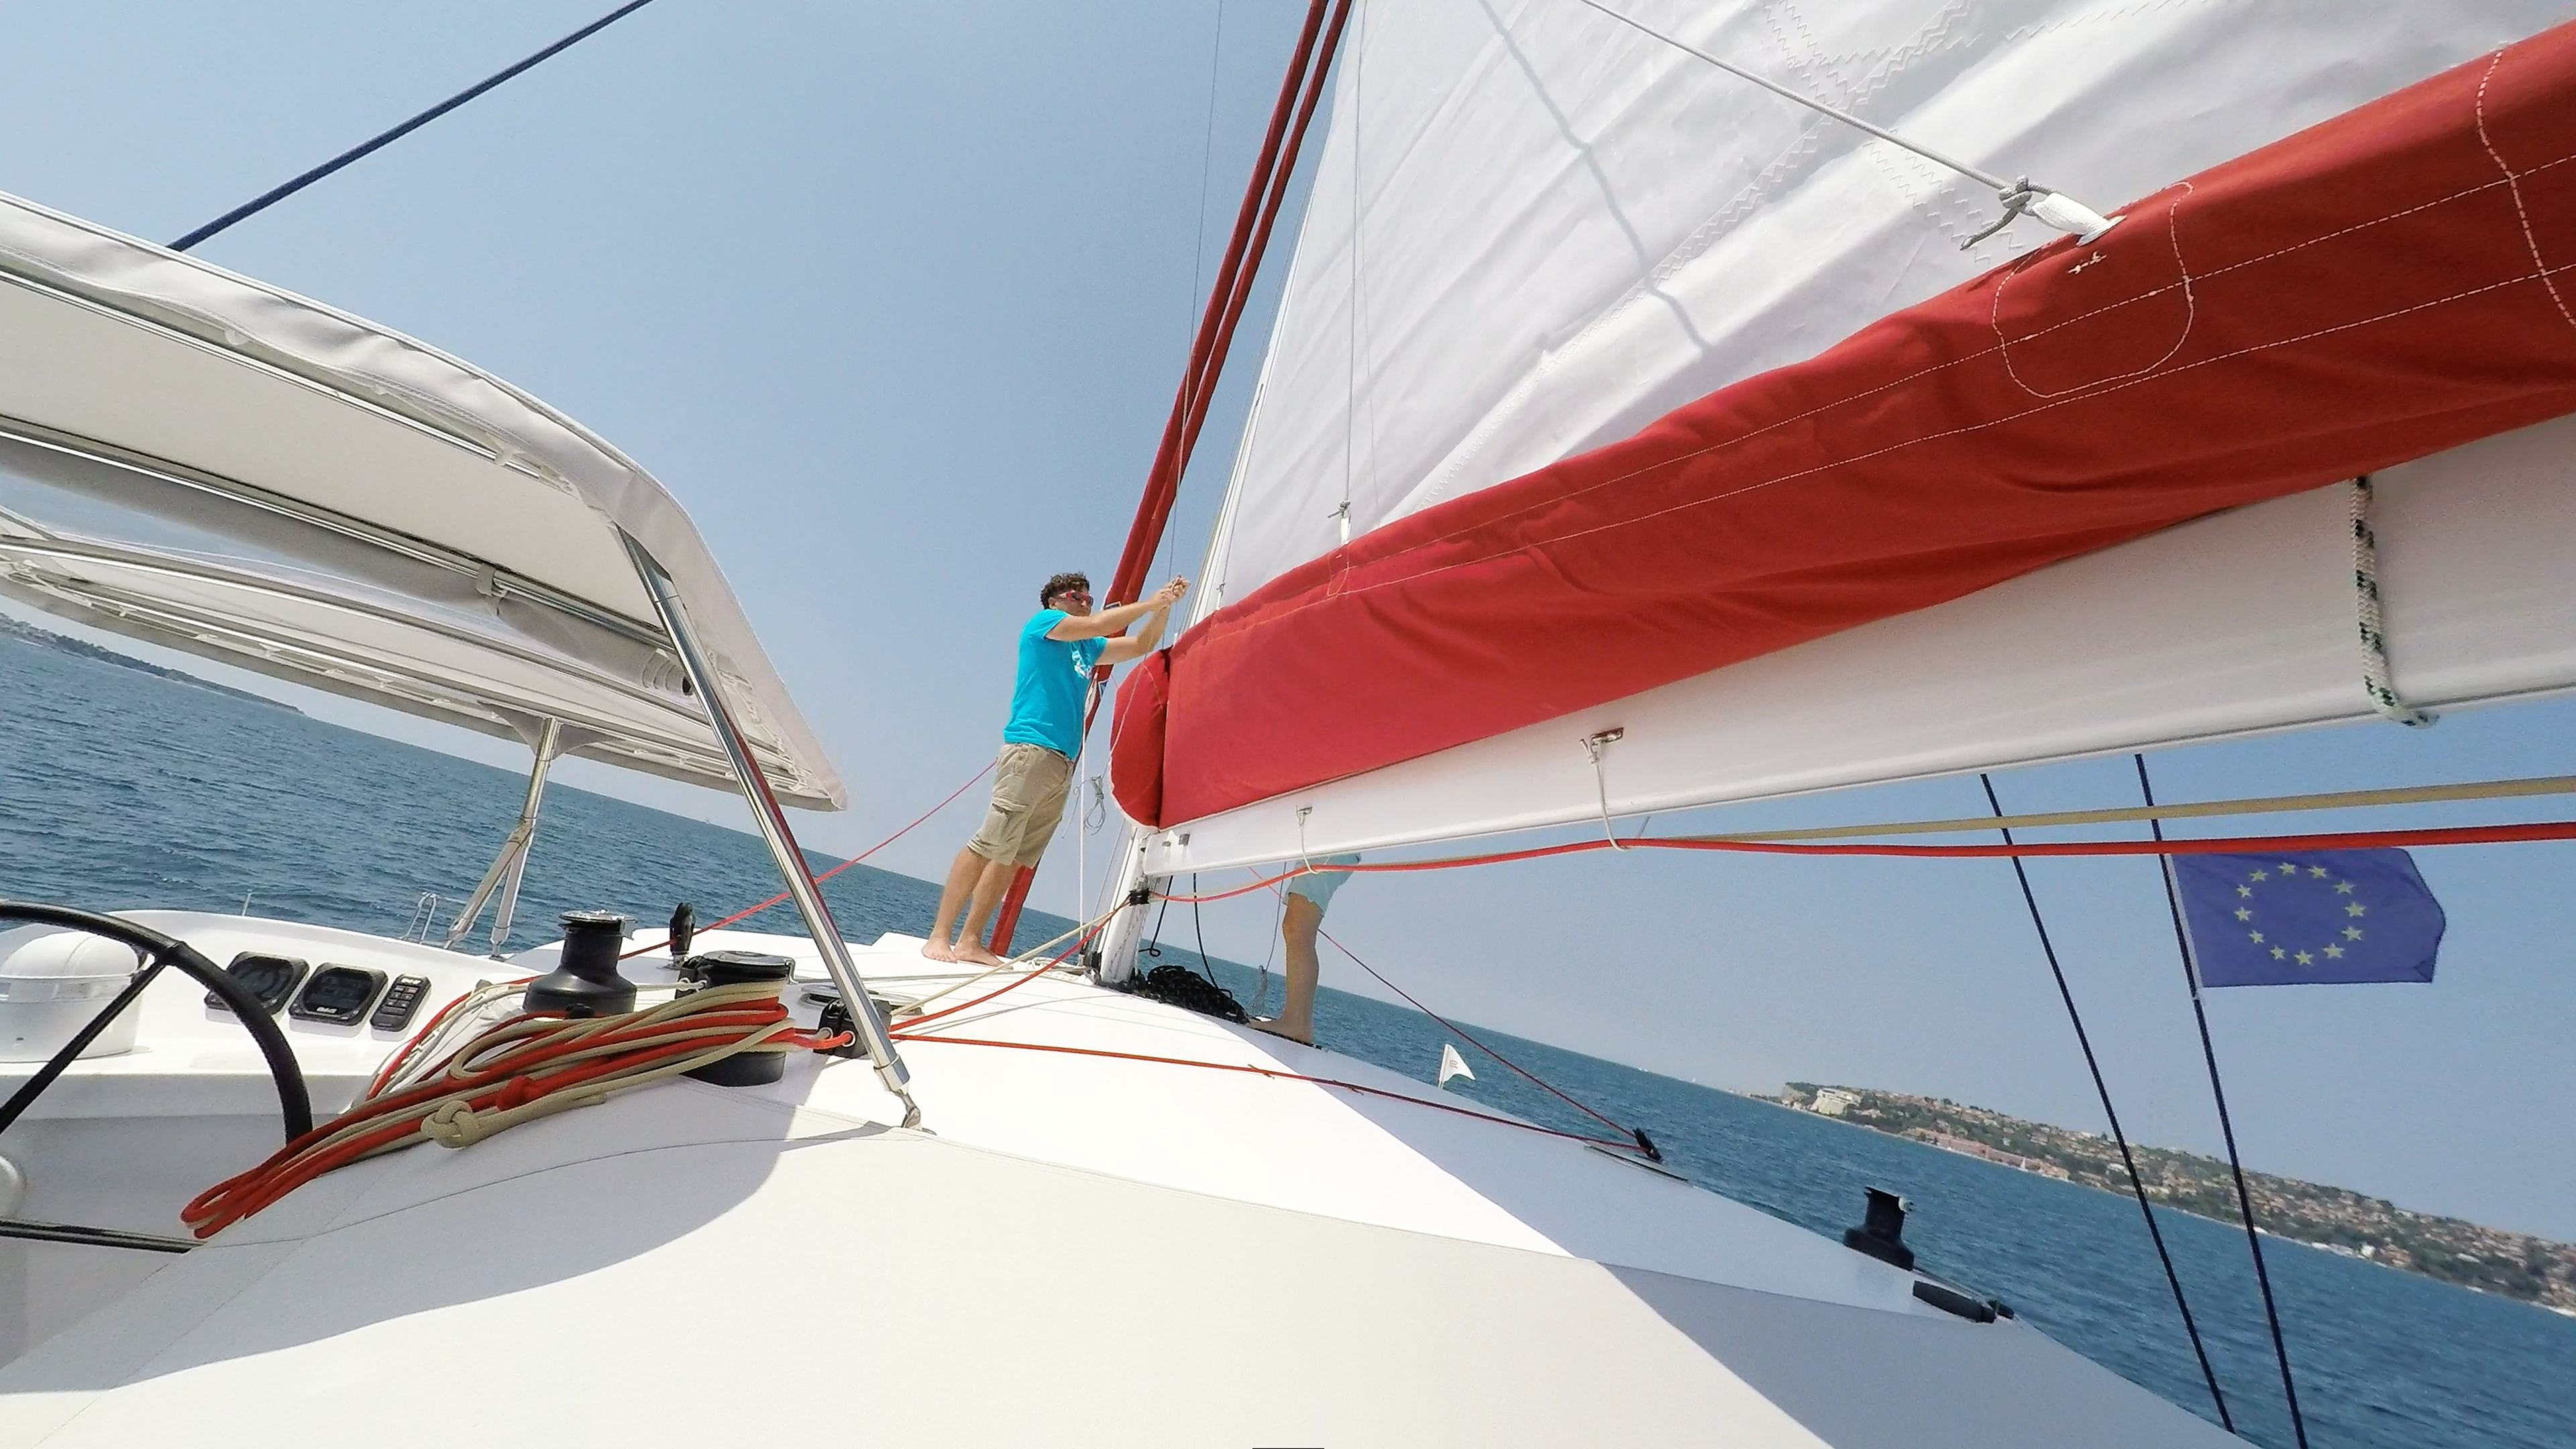 hoisting randa barca a vela trimarano neel 45